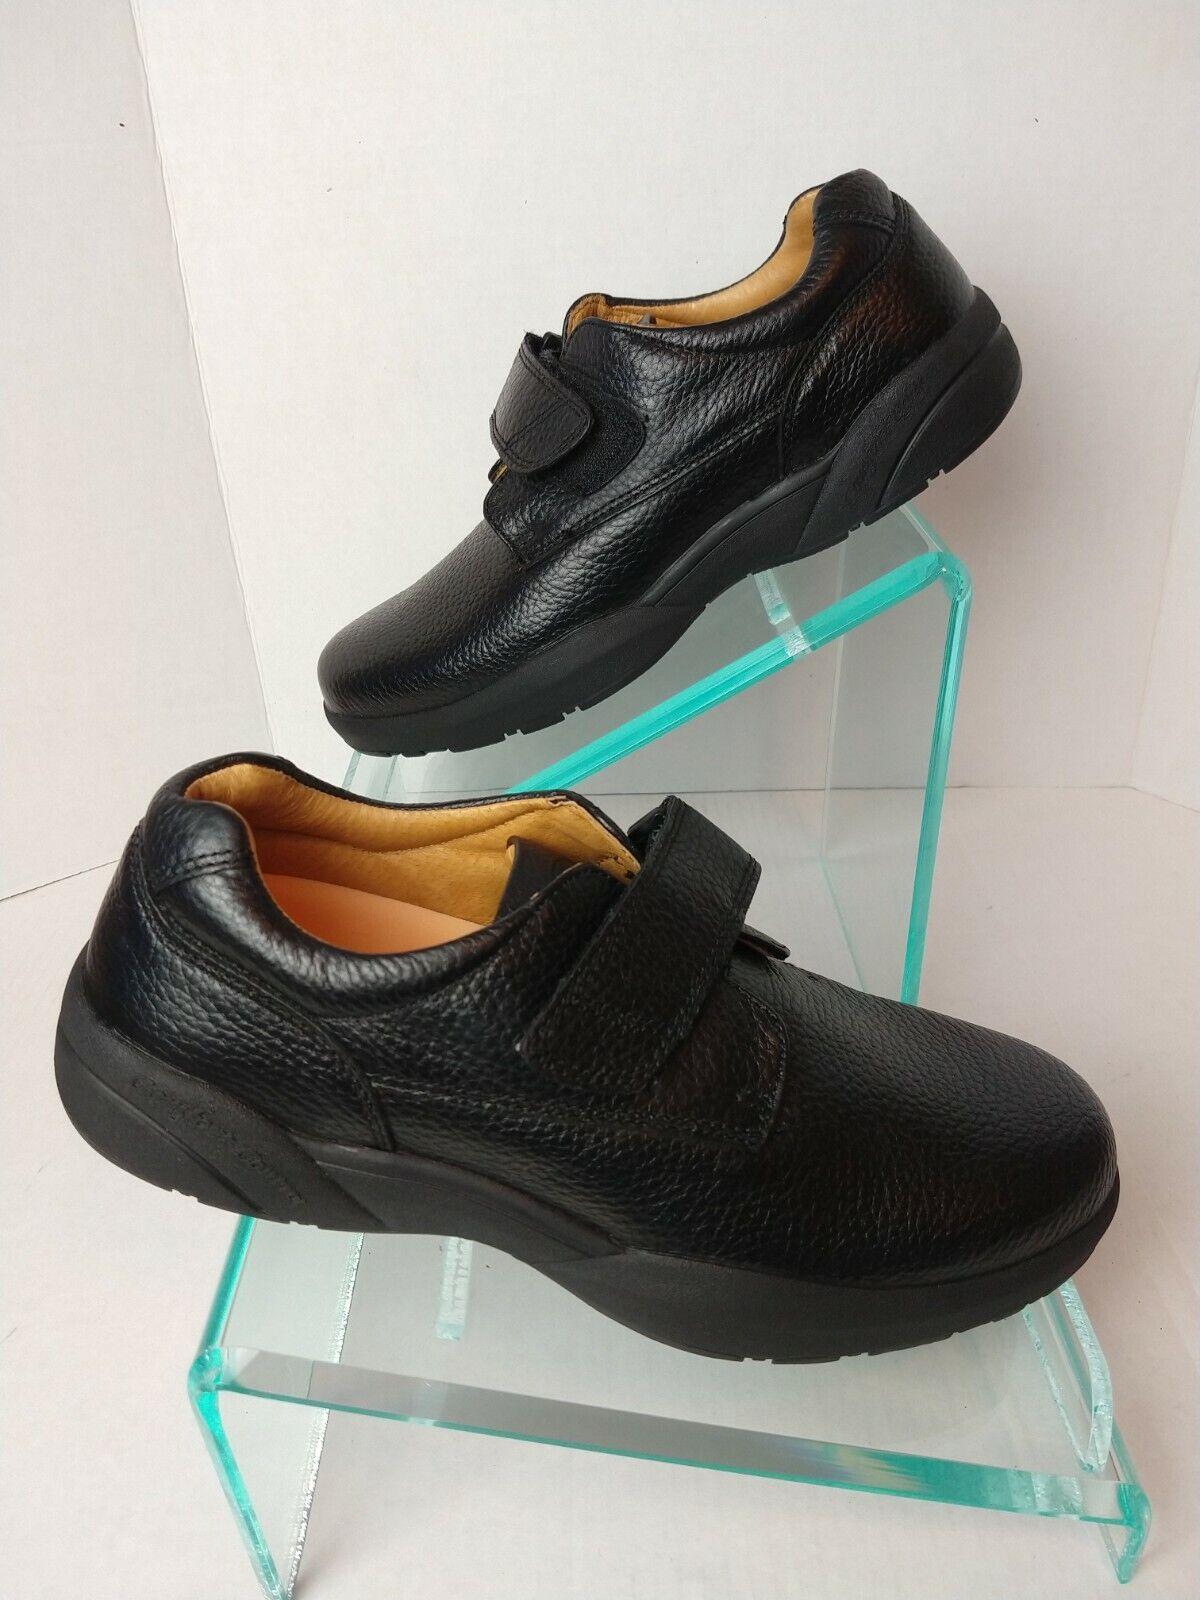 Dr. Comfort William Blk Leather Hook Loop Strap Loafers Shoes Men's 11M. #767